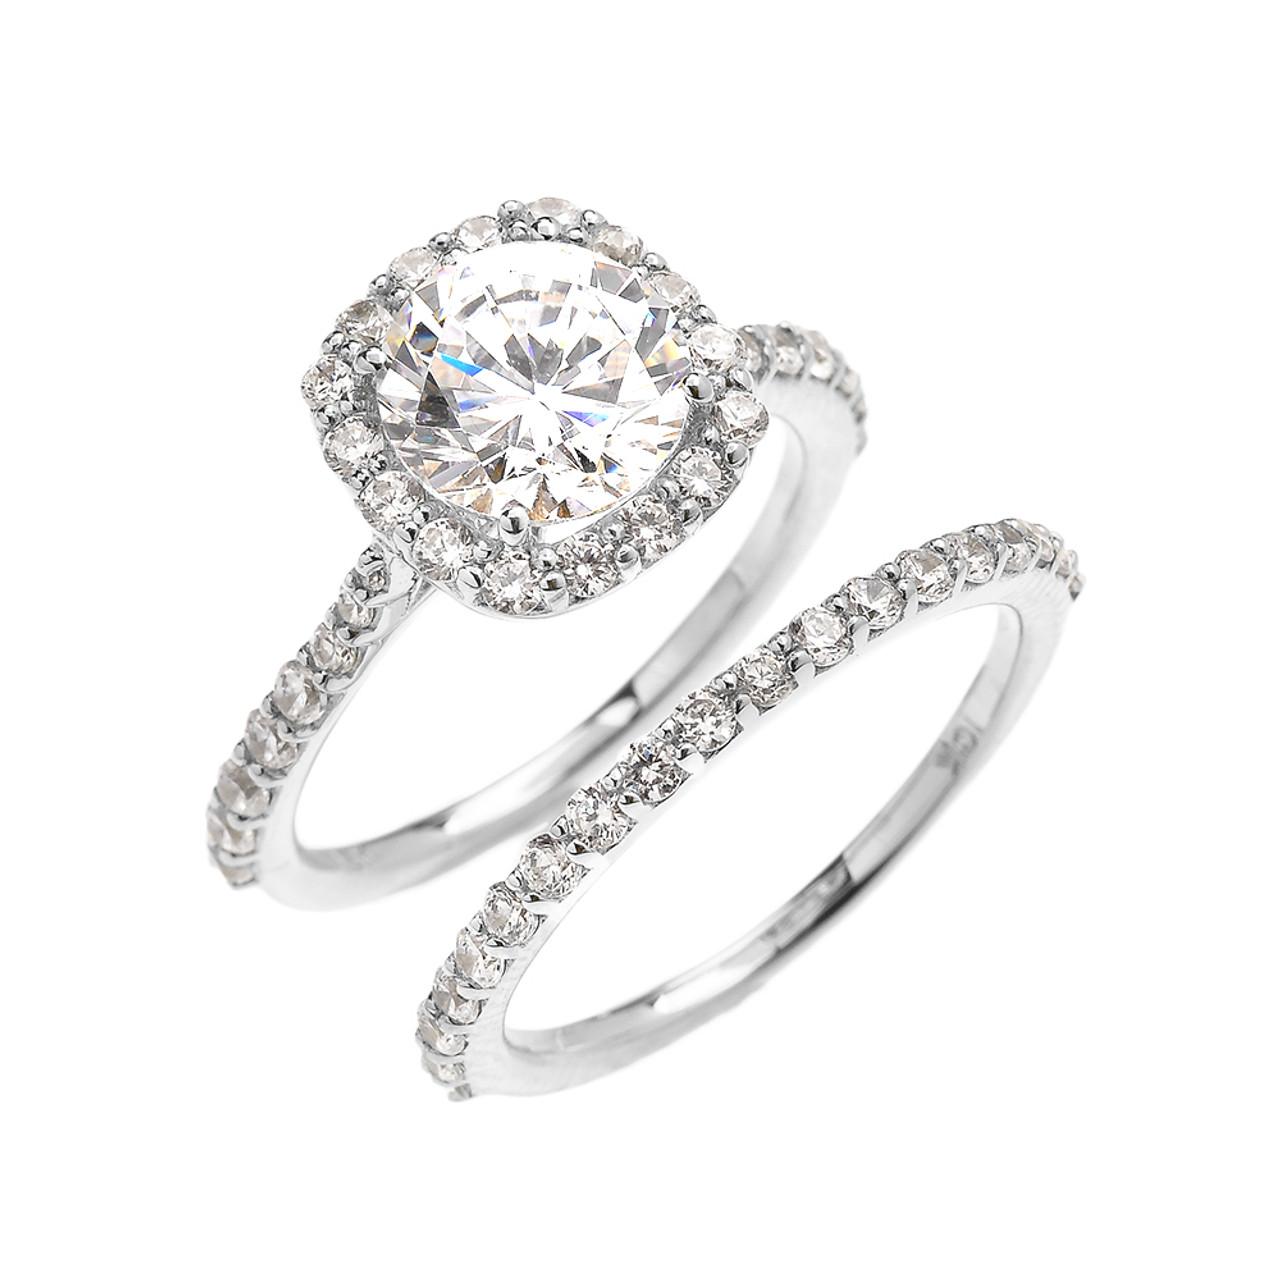 Beautiful Wedding Rings.Beautiful Engagement Ring Dainty 3 Carat Halo Cz Ring Set In White Gold